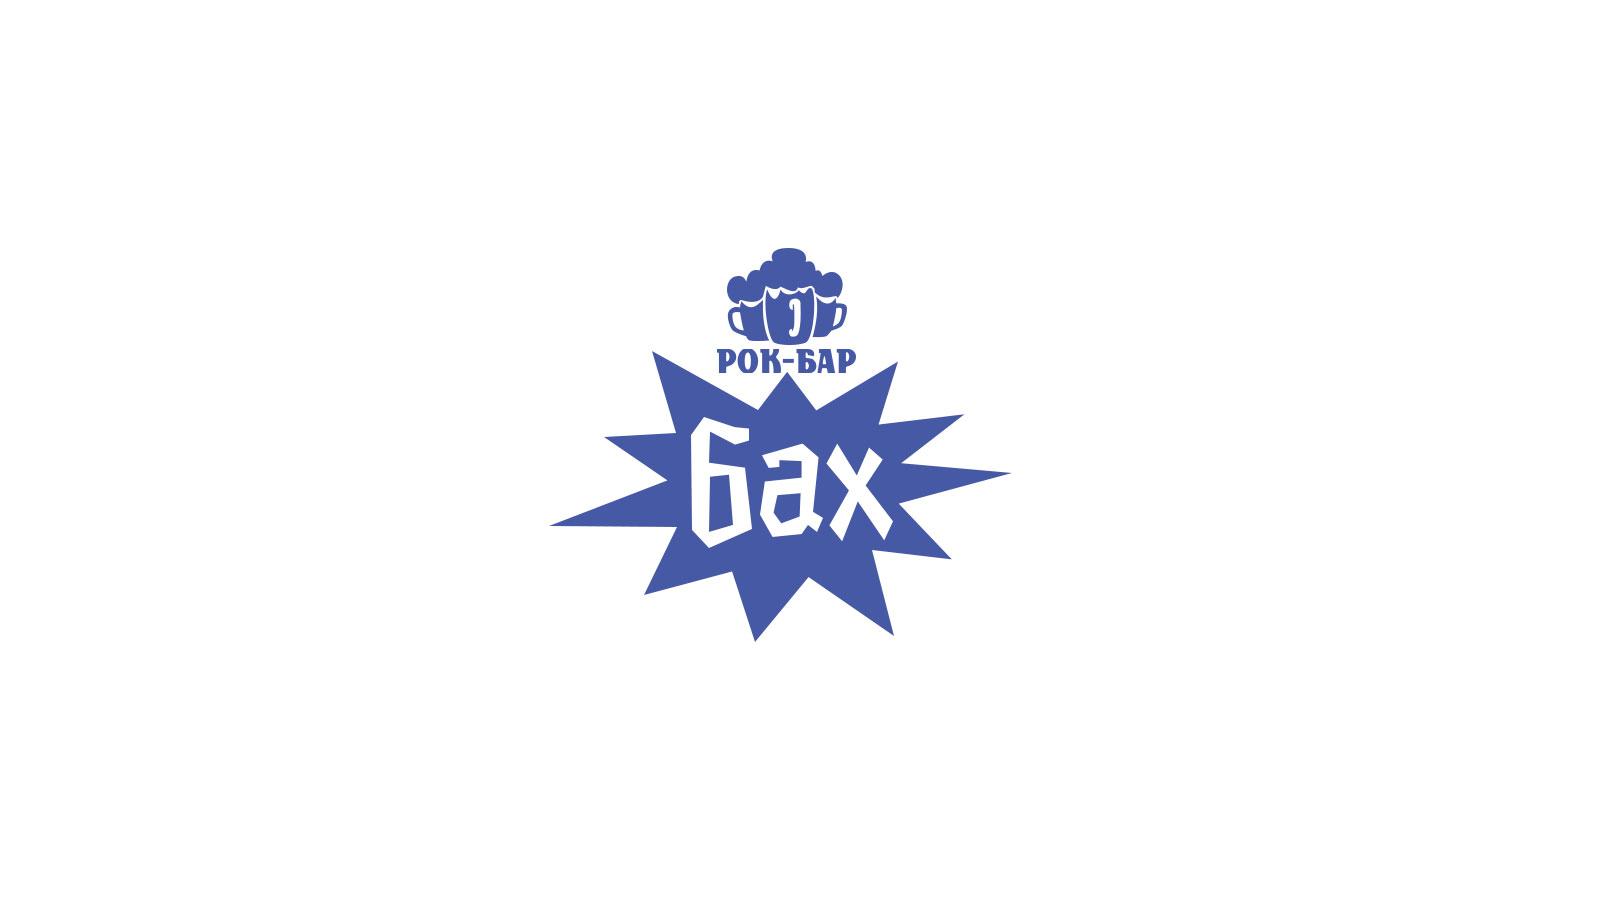 "Разработать логотип и вывеску рок-бару ""Бах"" фото f_92659b5086dd6317.jpg"